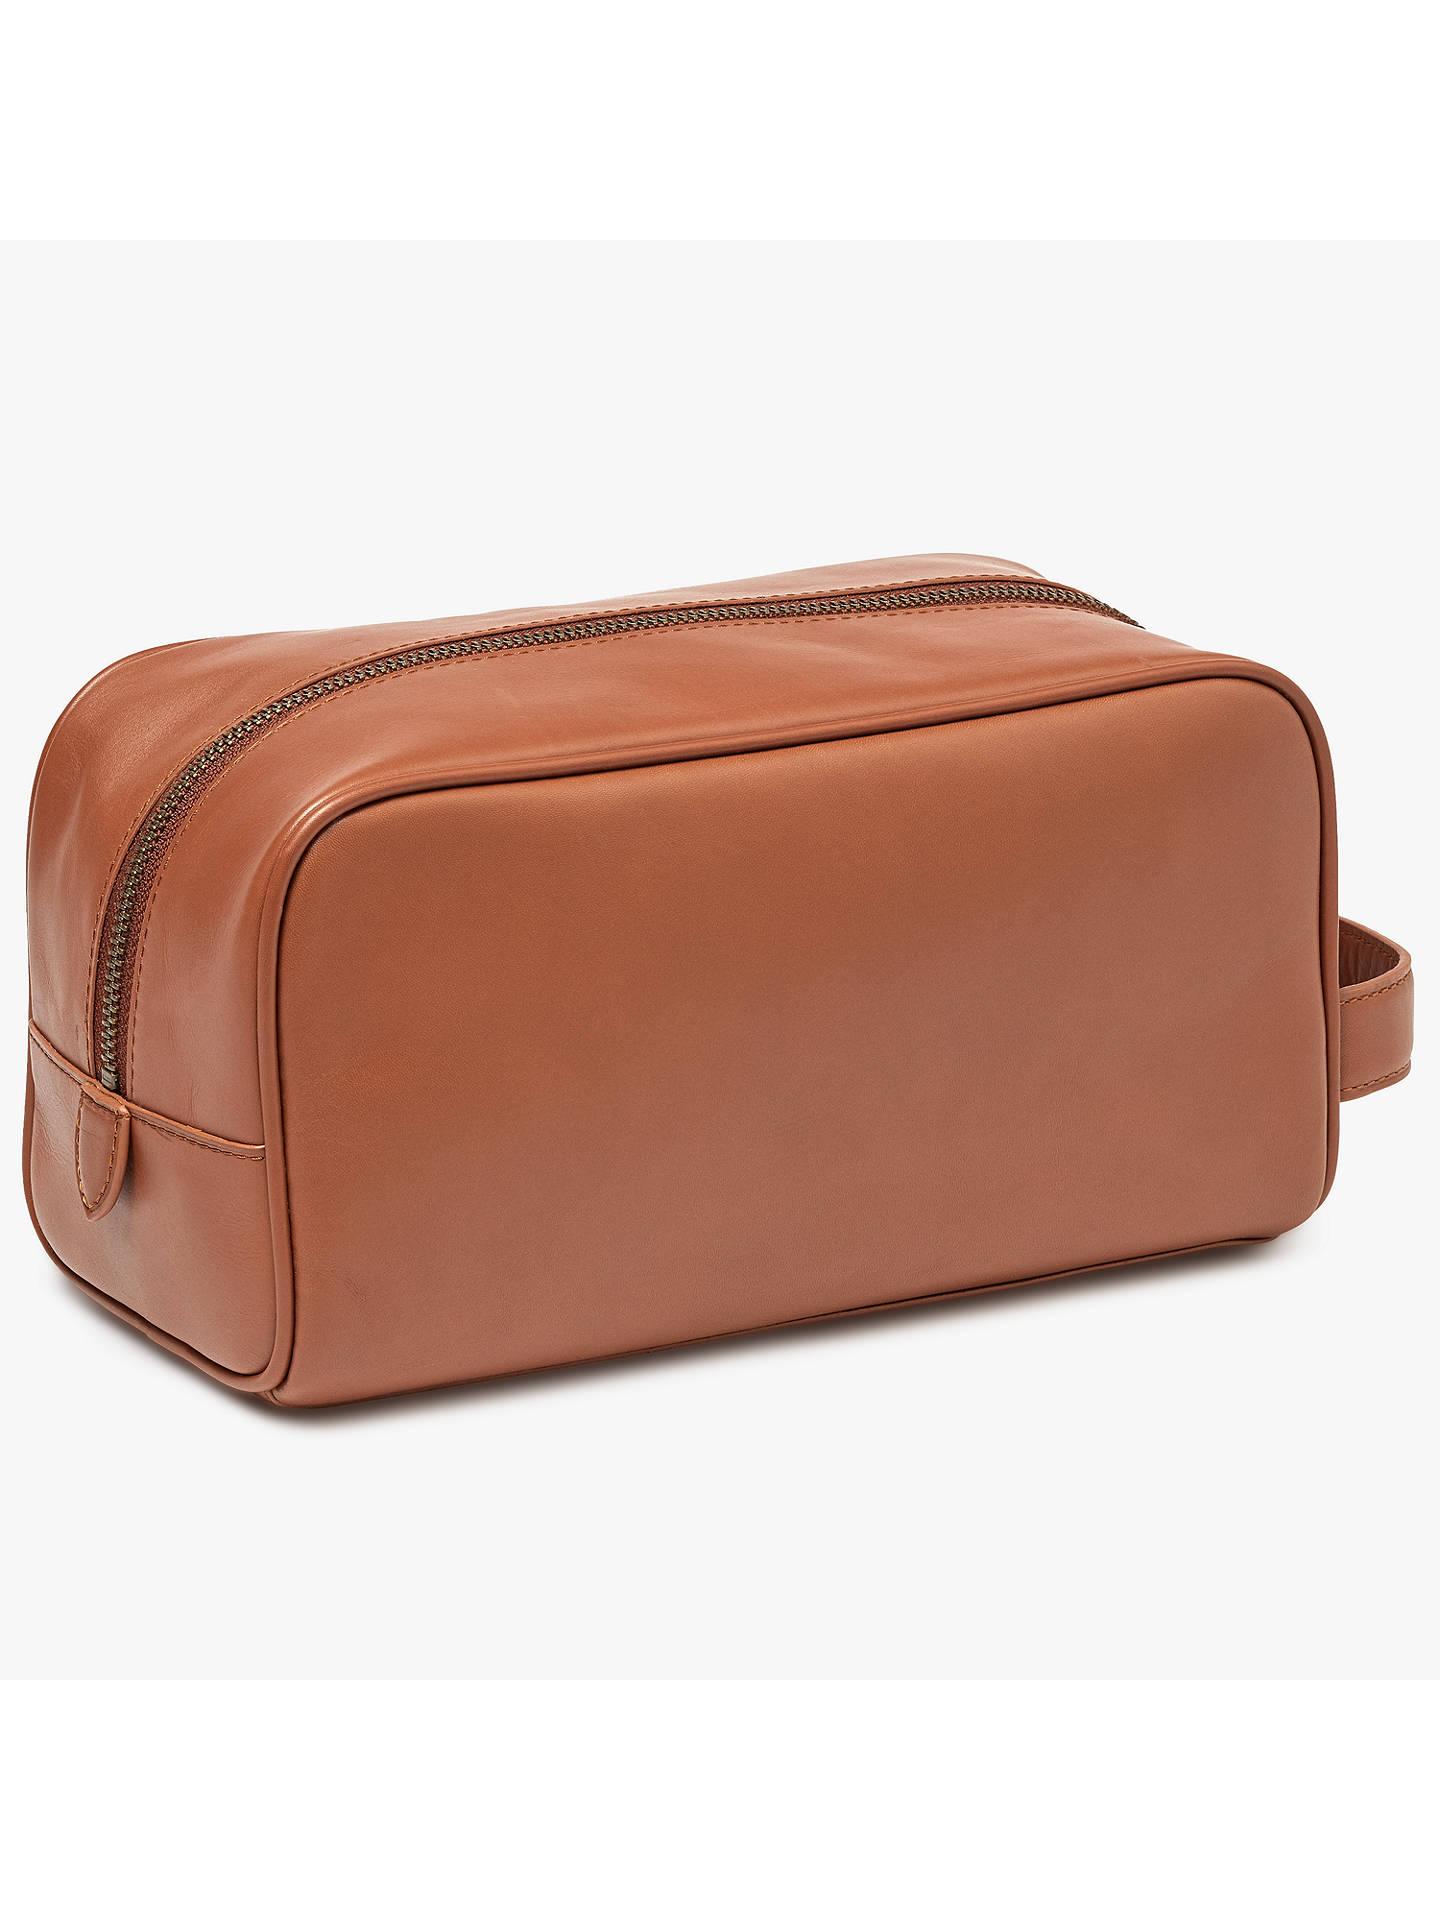 305074cb19 ... Buy Polo Ralph Lauren Leather Shave Kit Wash Bag